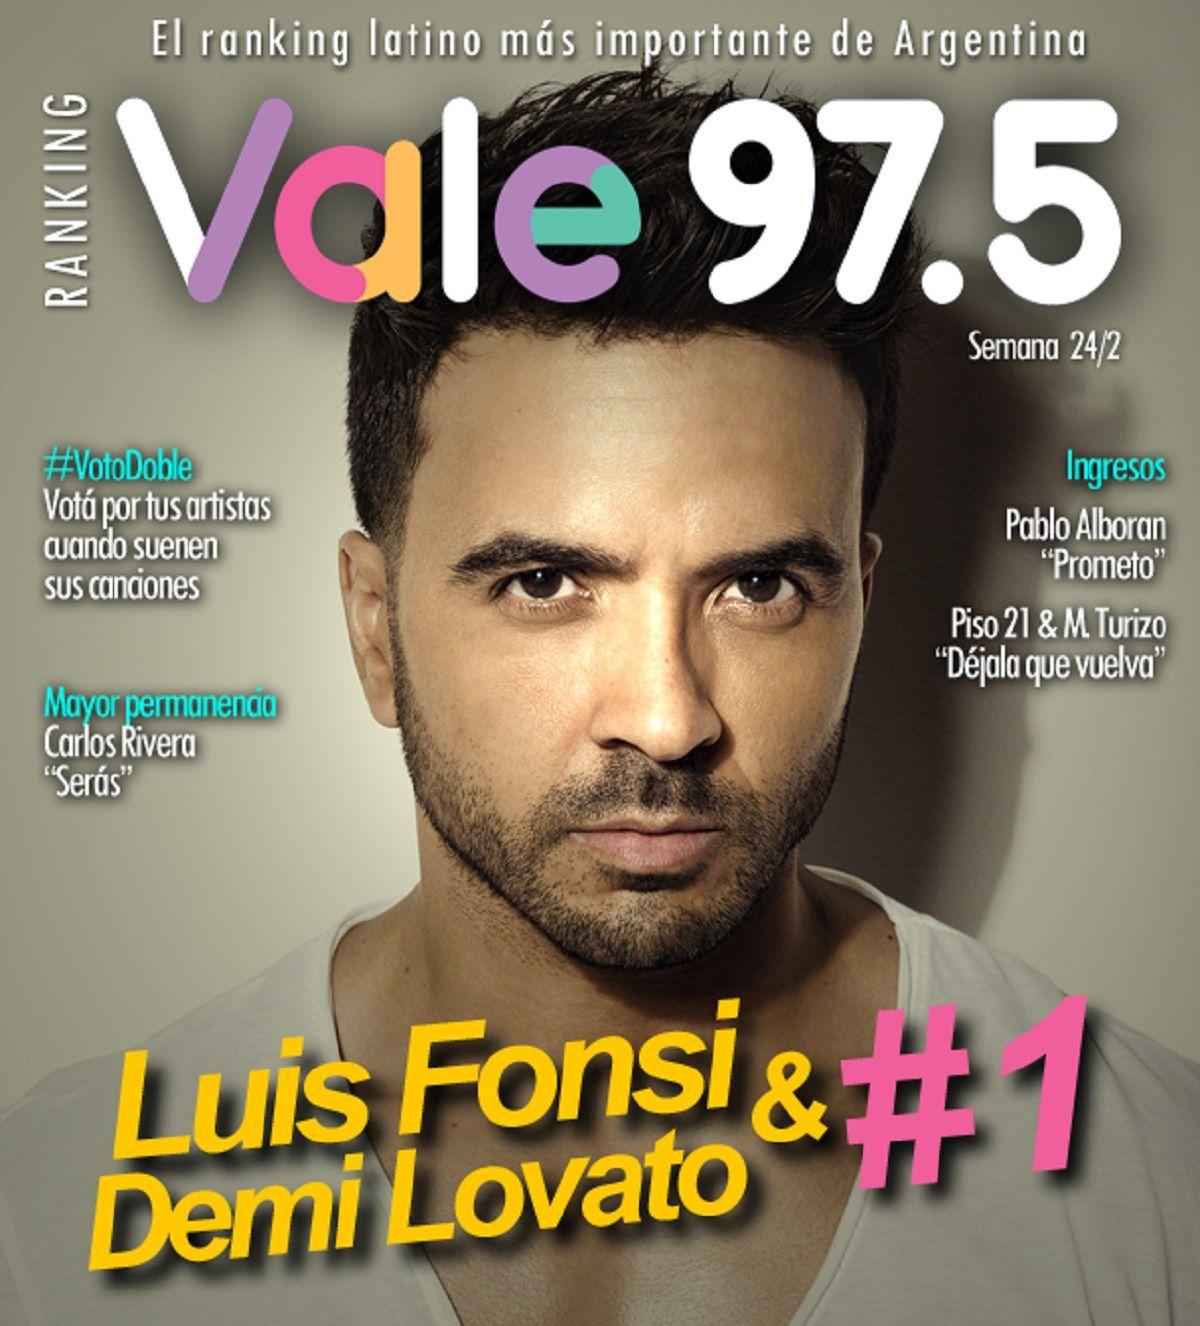 Luis Fonsi y Demi Lovato, líderes del Ranking Vale